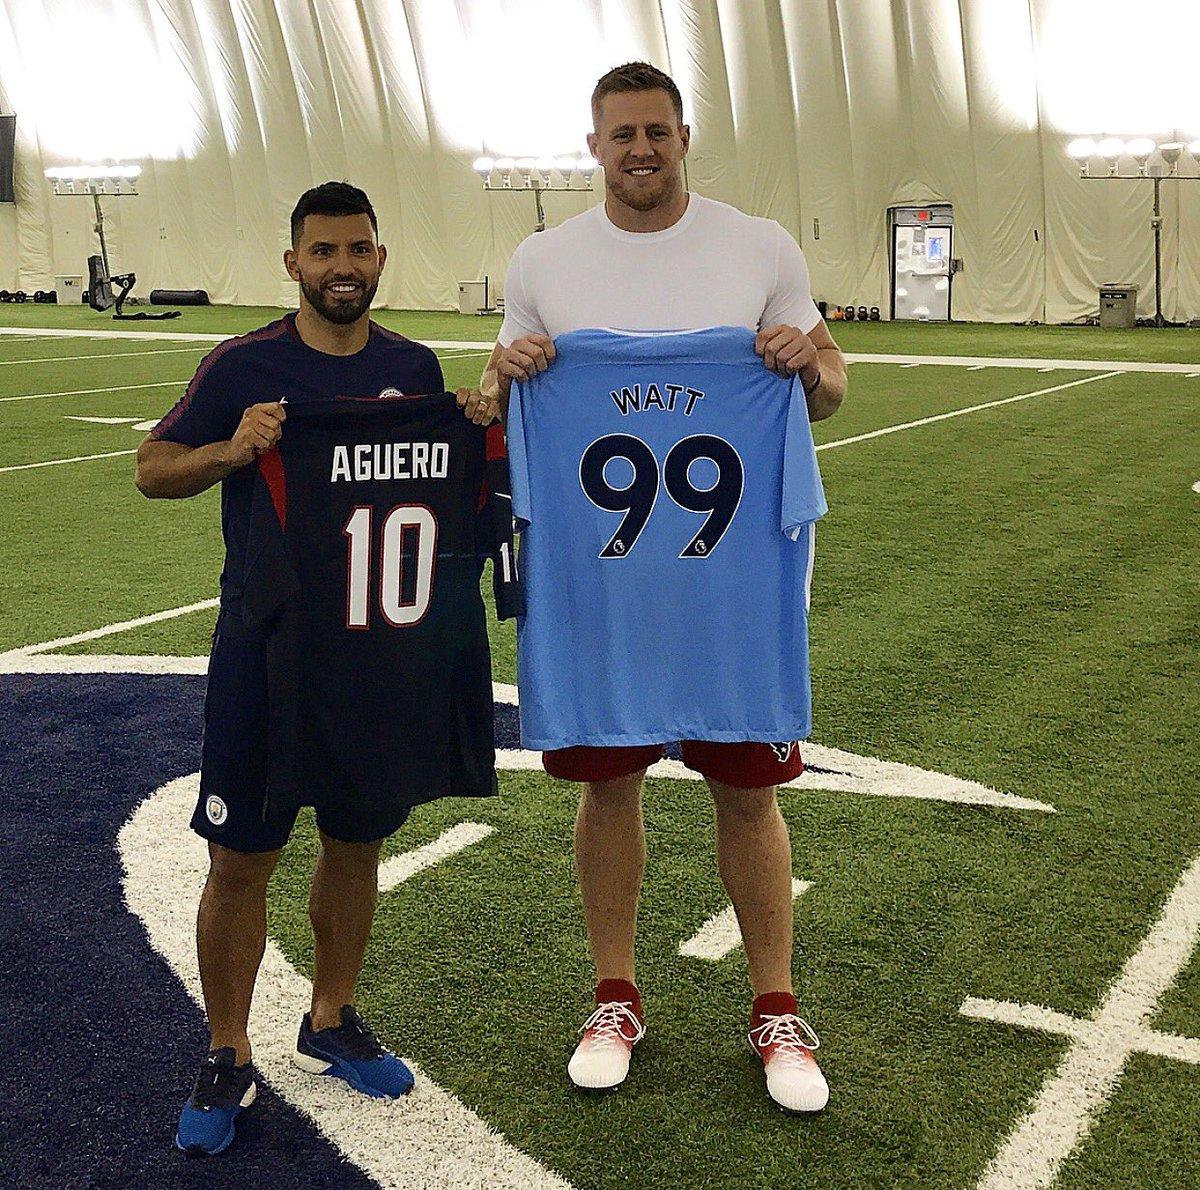 ¿Cuánto mide Sergio Kun Agüero? - Real height DFI2_98VwAAfB9L